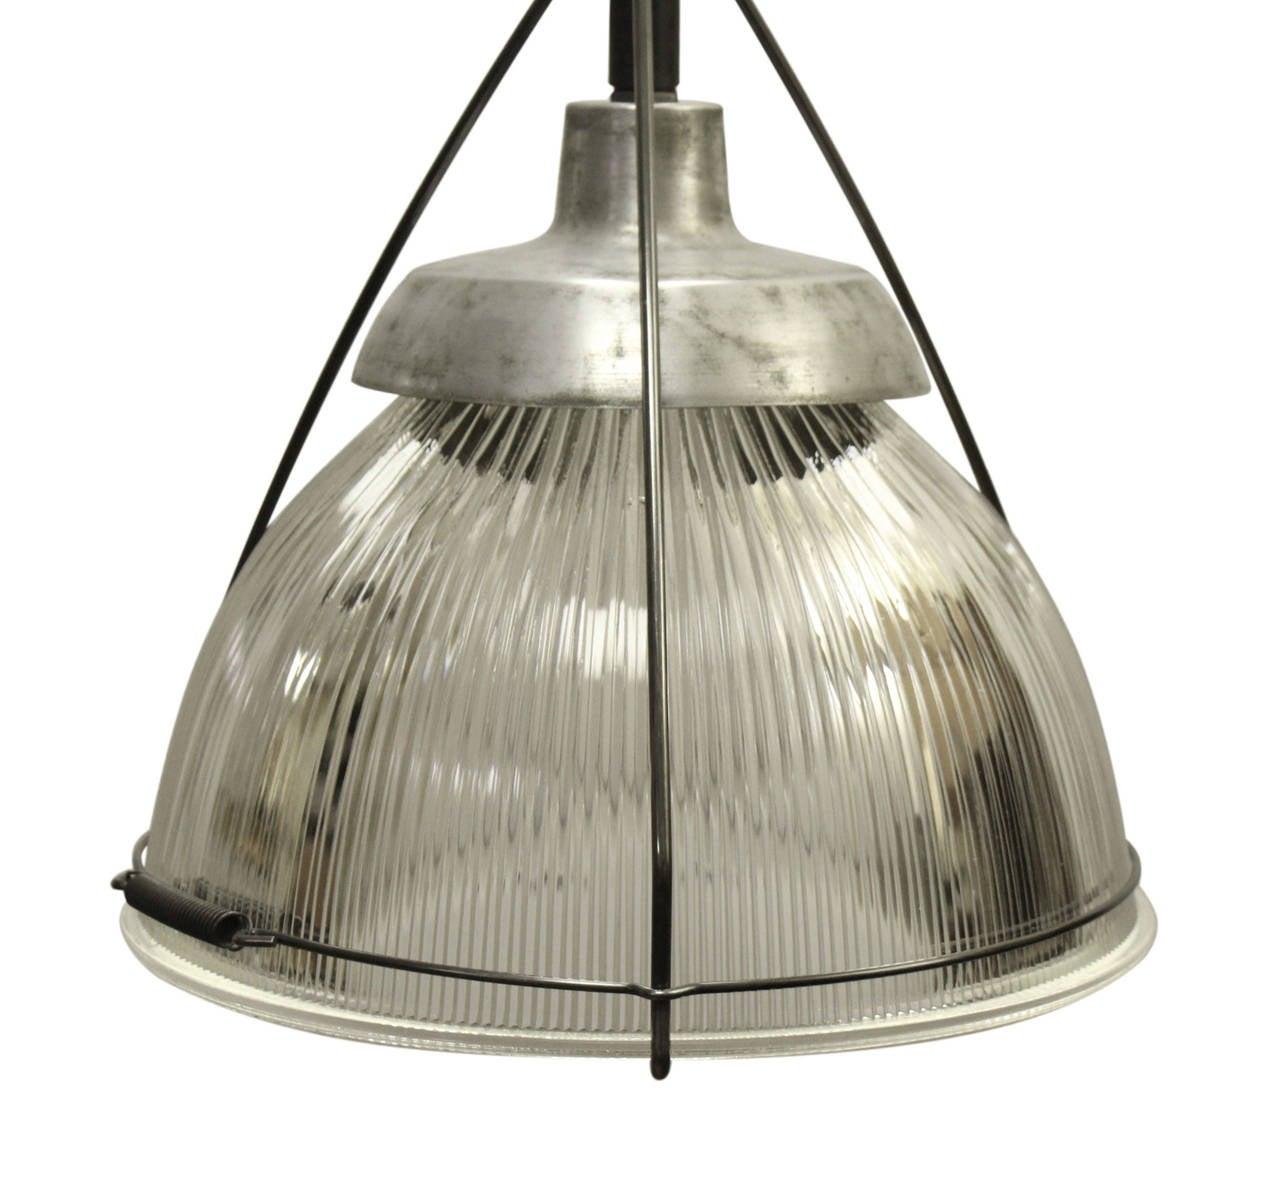 Pendant Light Sale: Industrial Holophane Pendant Light For Sale At 1stdibs